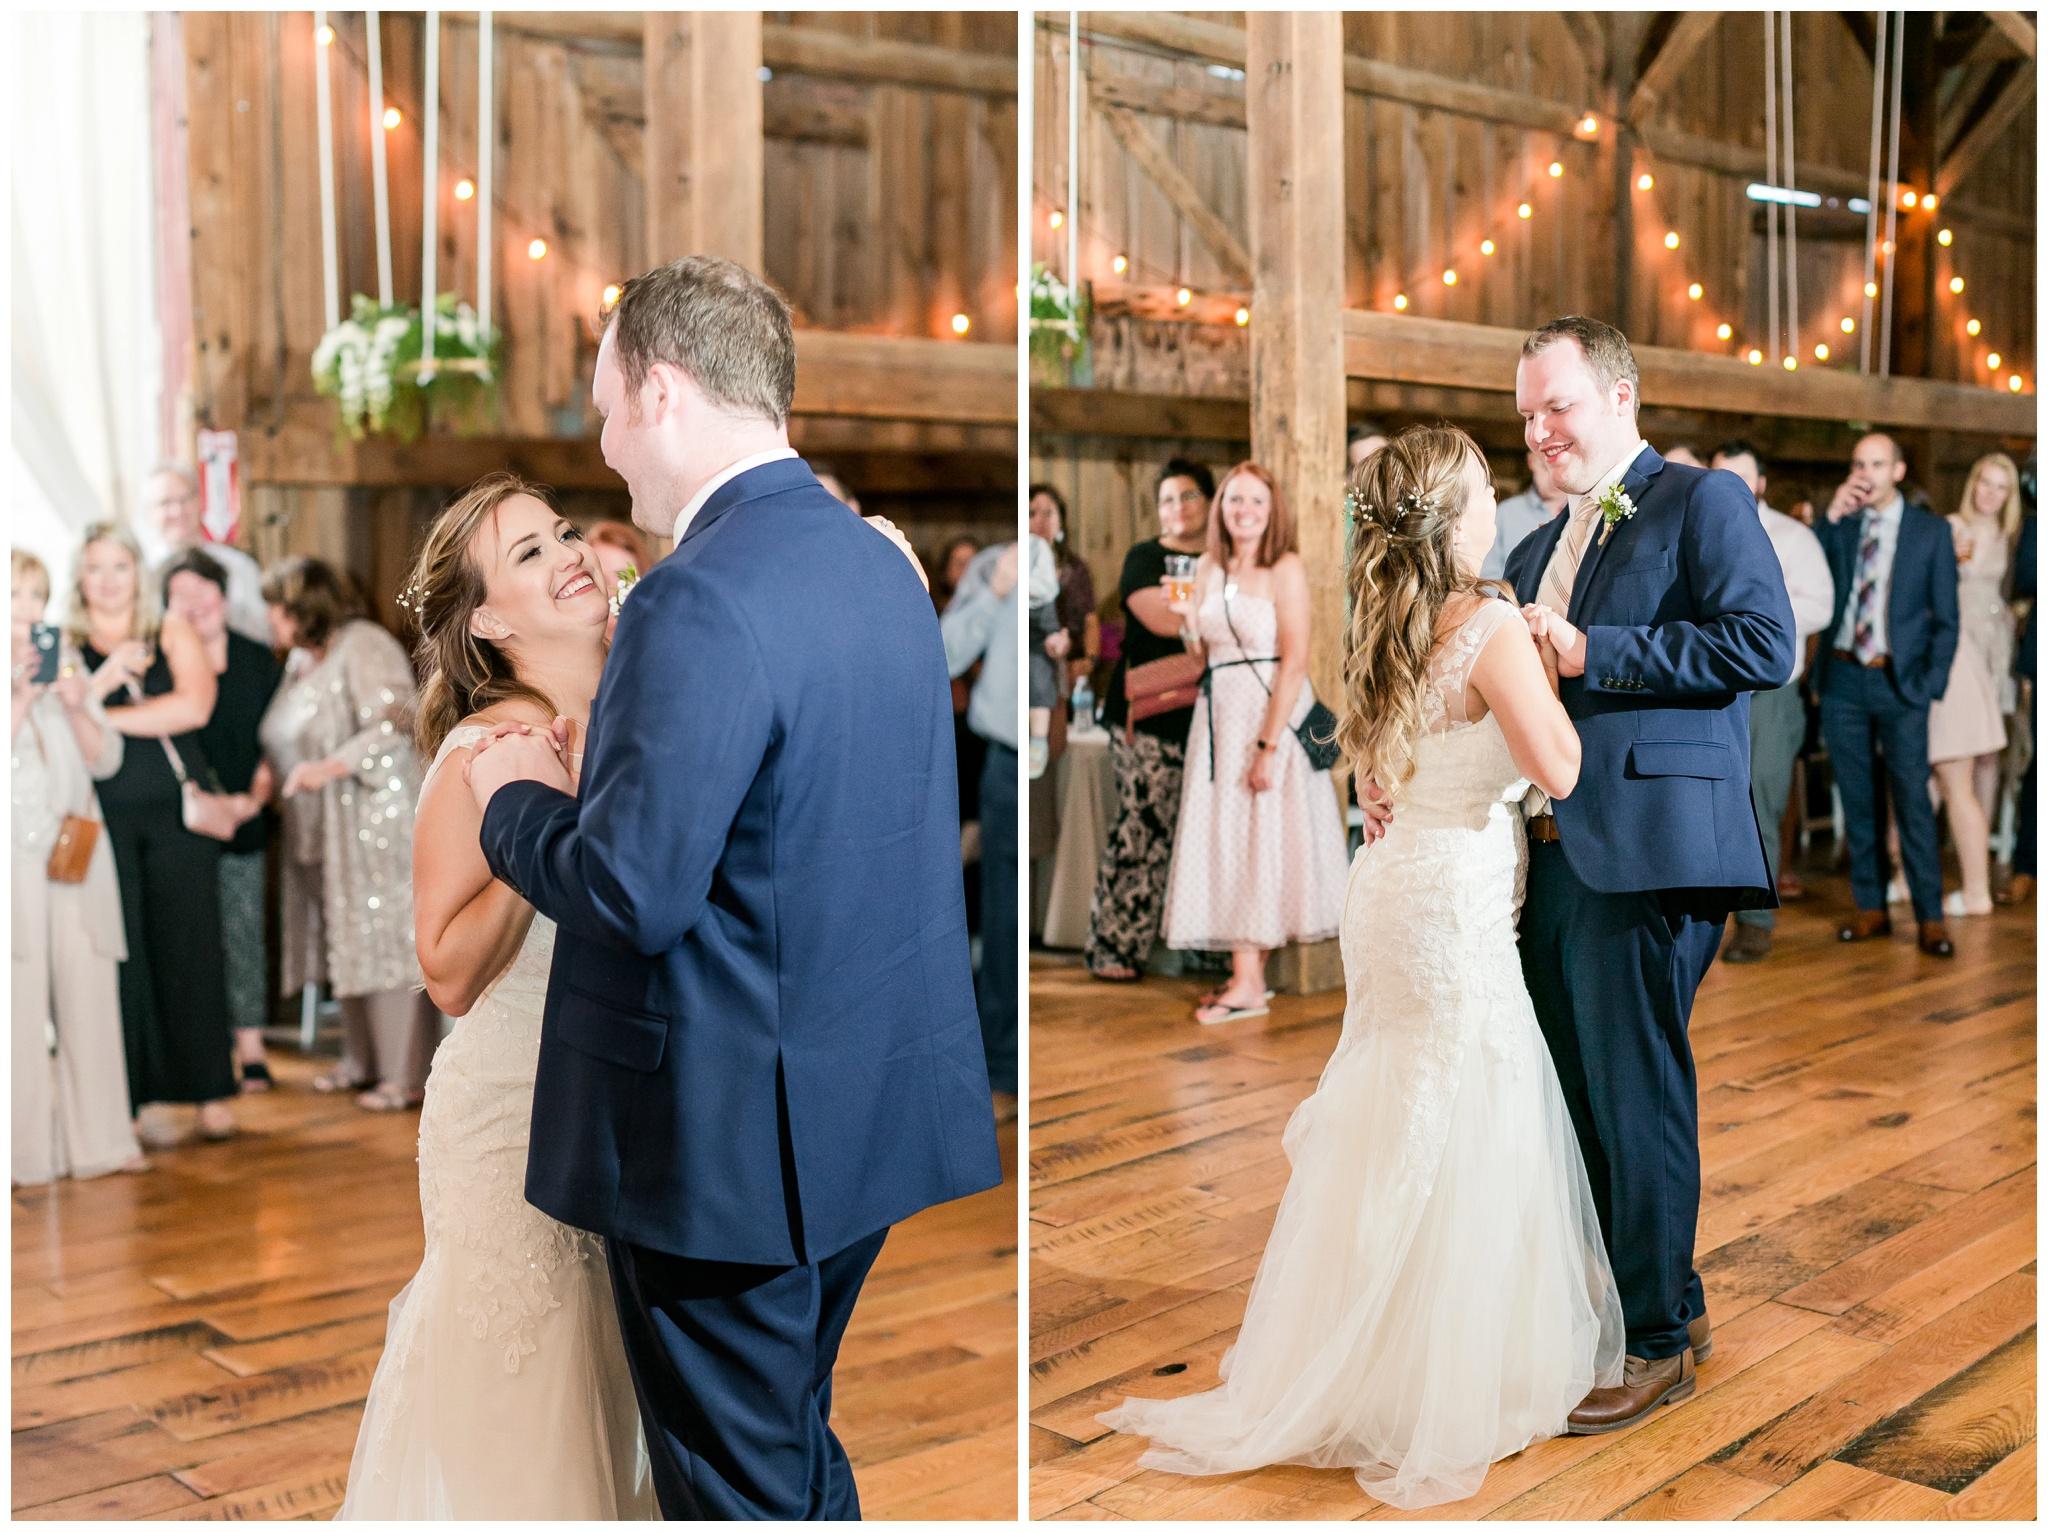 over_the_vines_wedding_edgerton_wisconsin_wedding_caynay_photo_4042.jpg